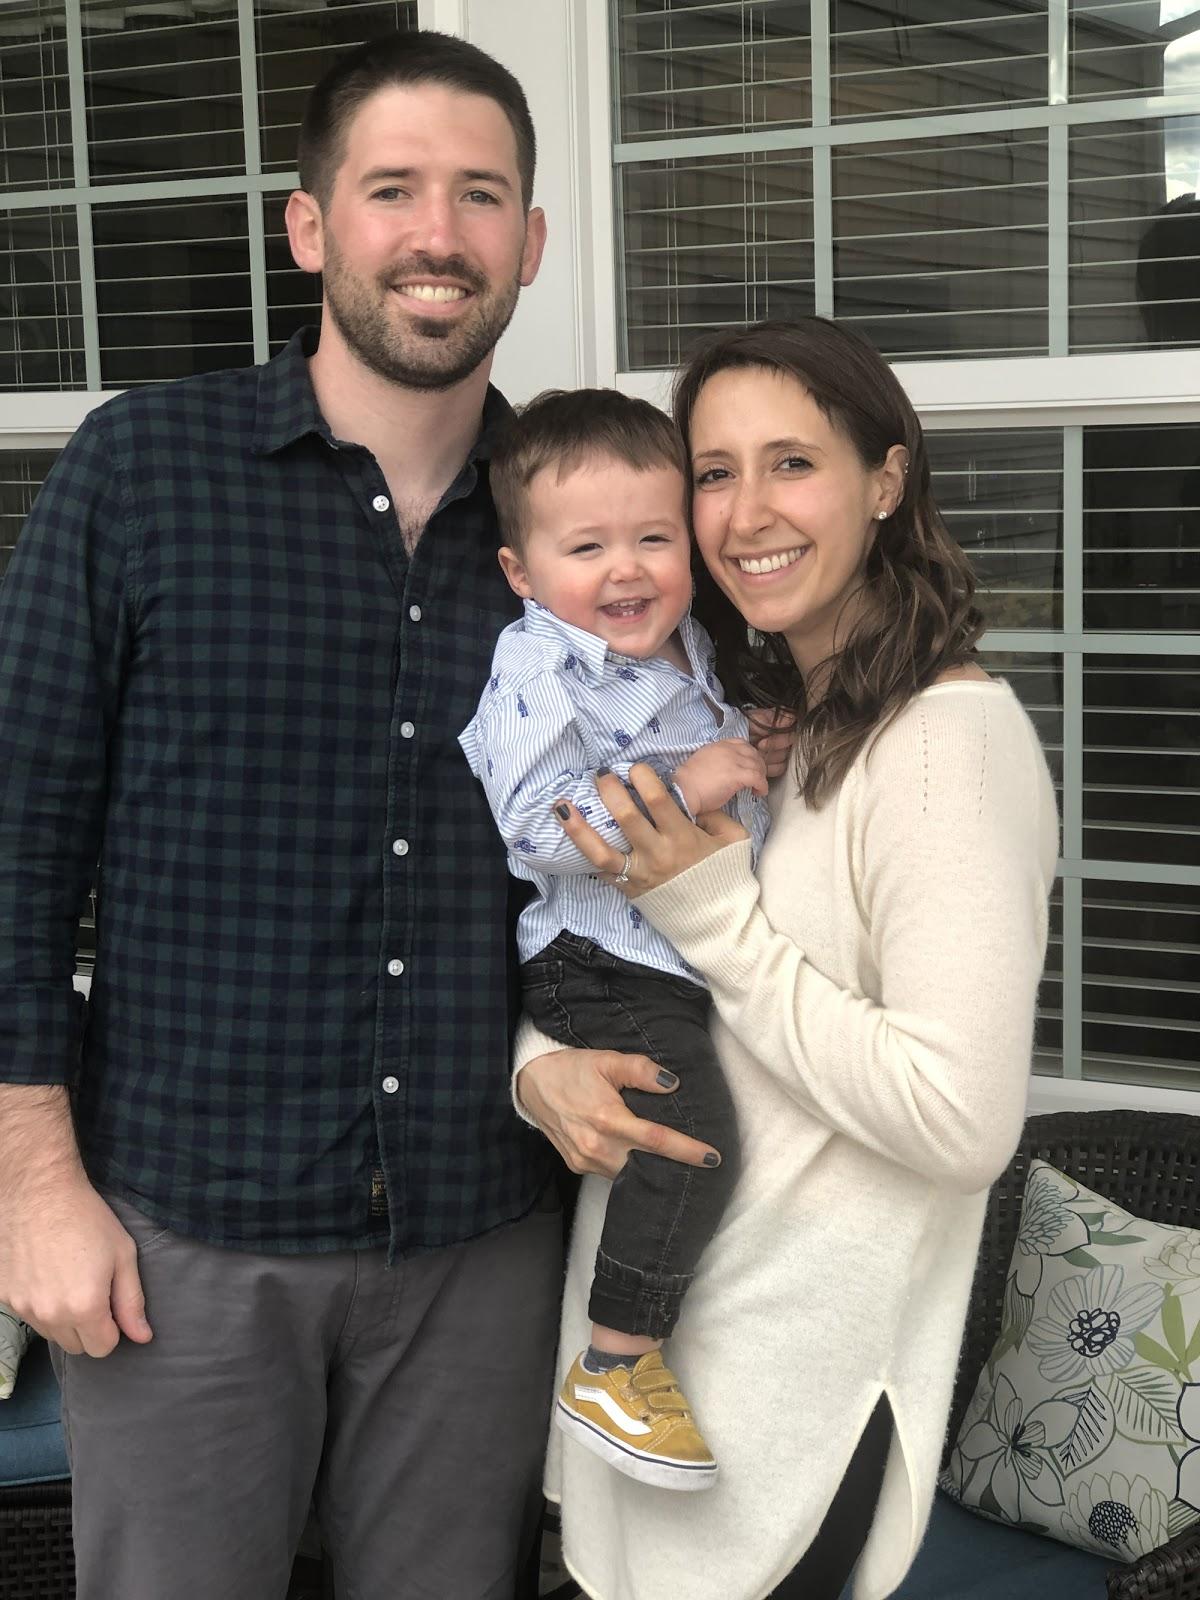 nj mom Alison Diamond and Baby Dooli PurePail Diaper Pail our njmompreneur of the week